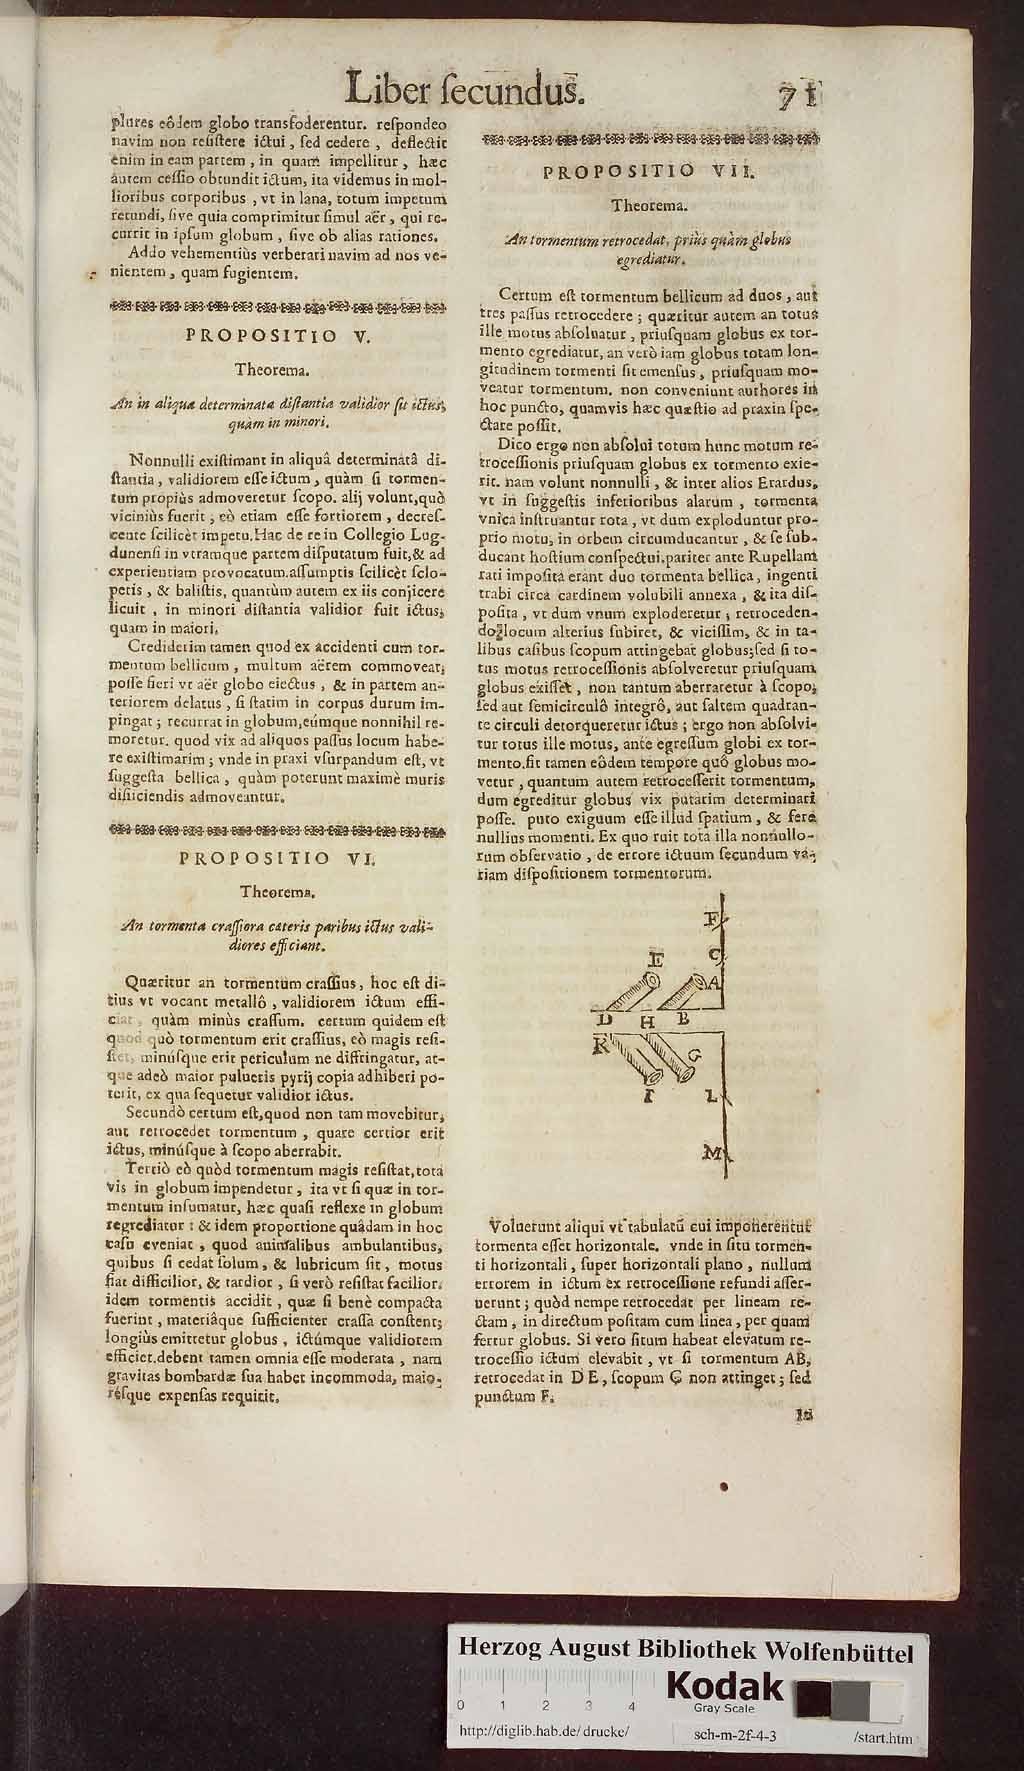 http://diglib.hab.de/drucke/sch-m-2f-4-3/00111.jpg